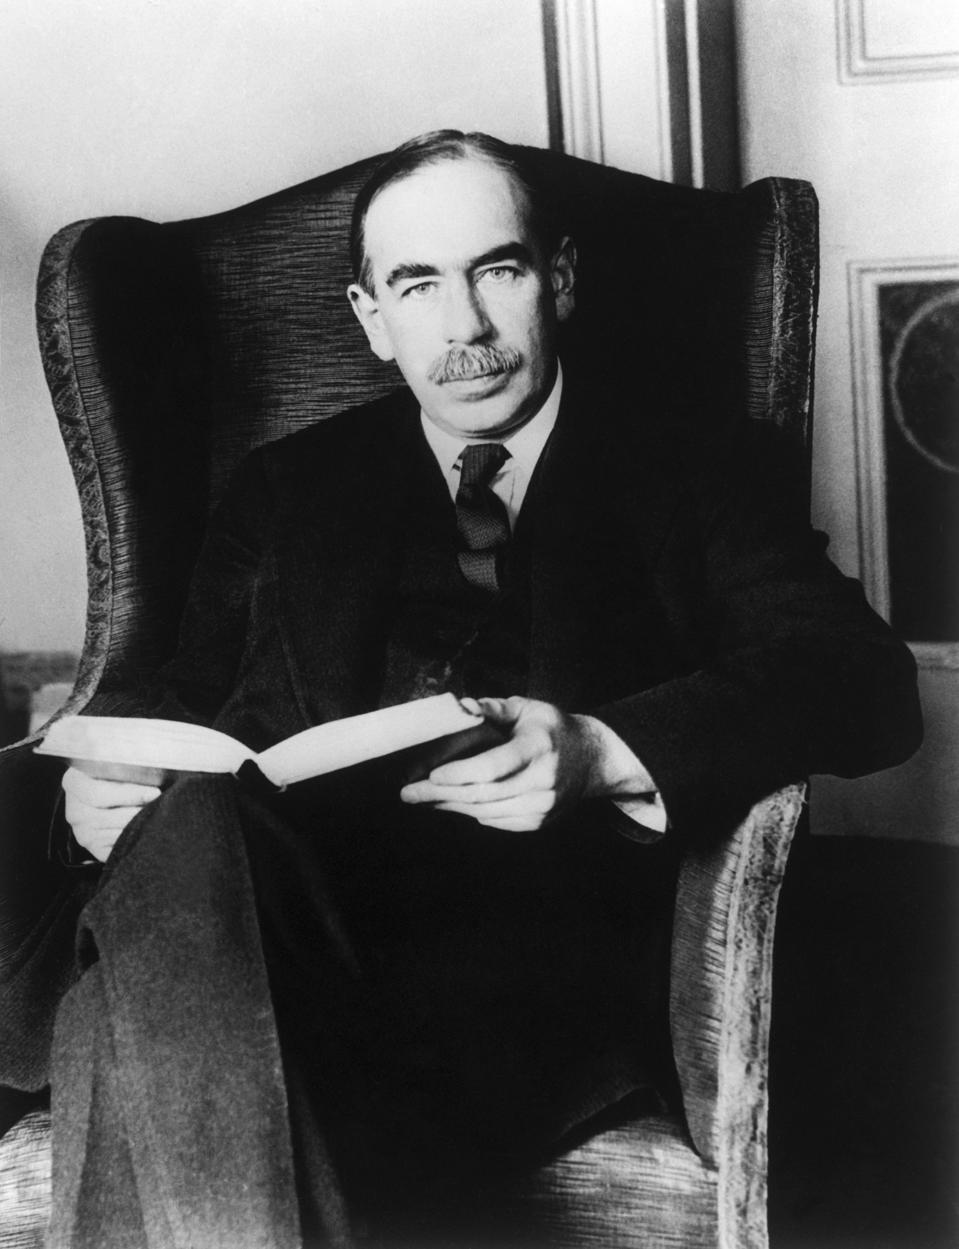 John Maynard Keynes Holding a Book